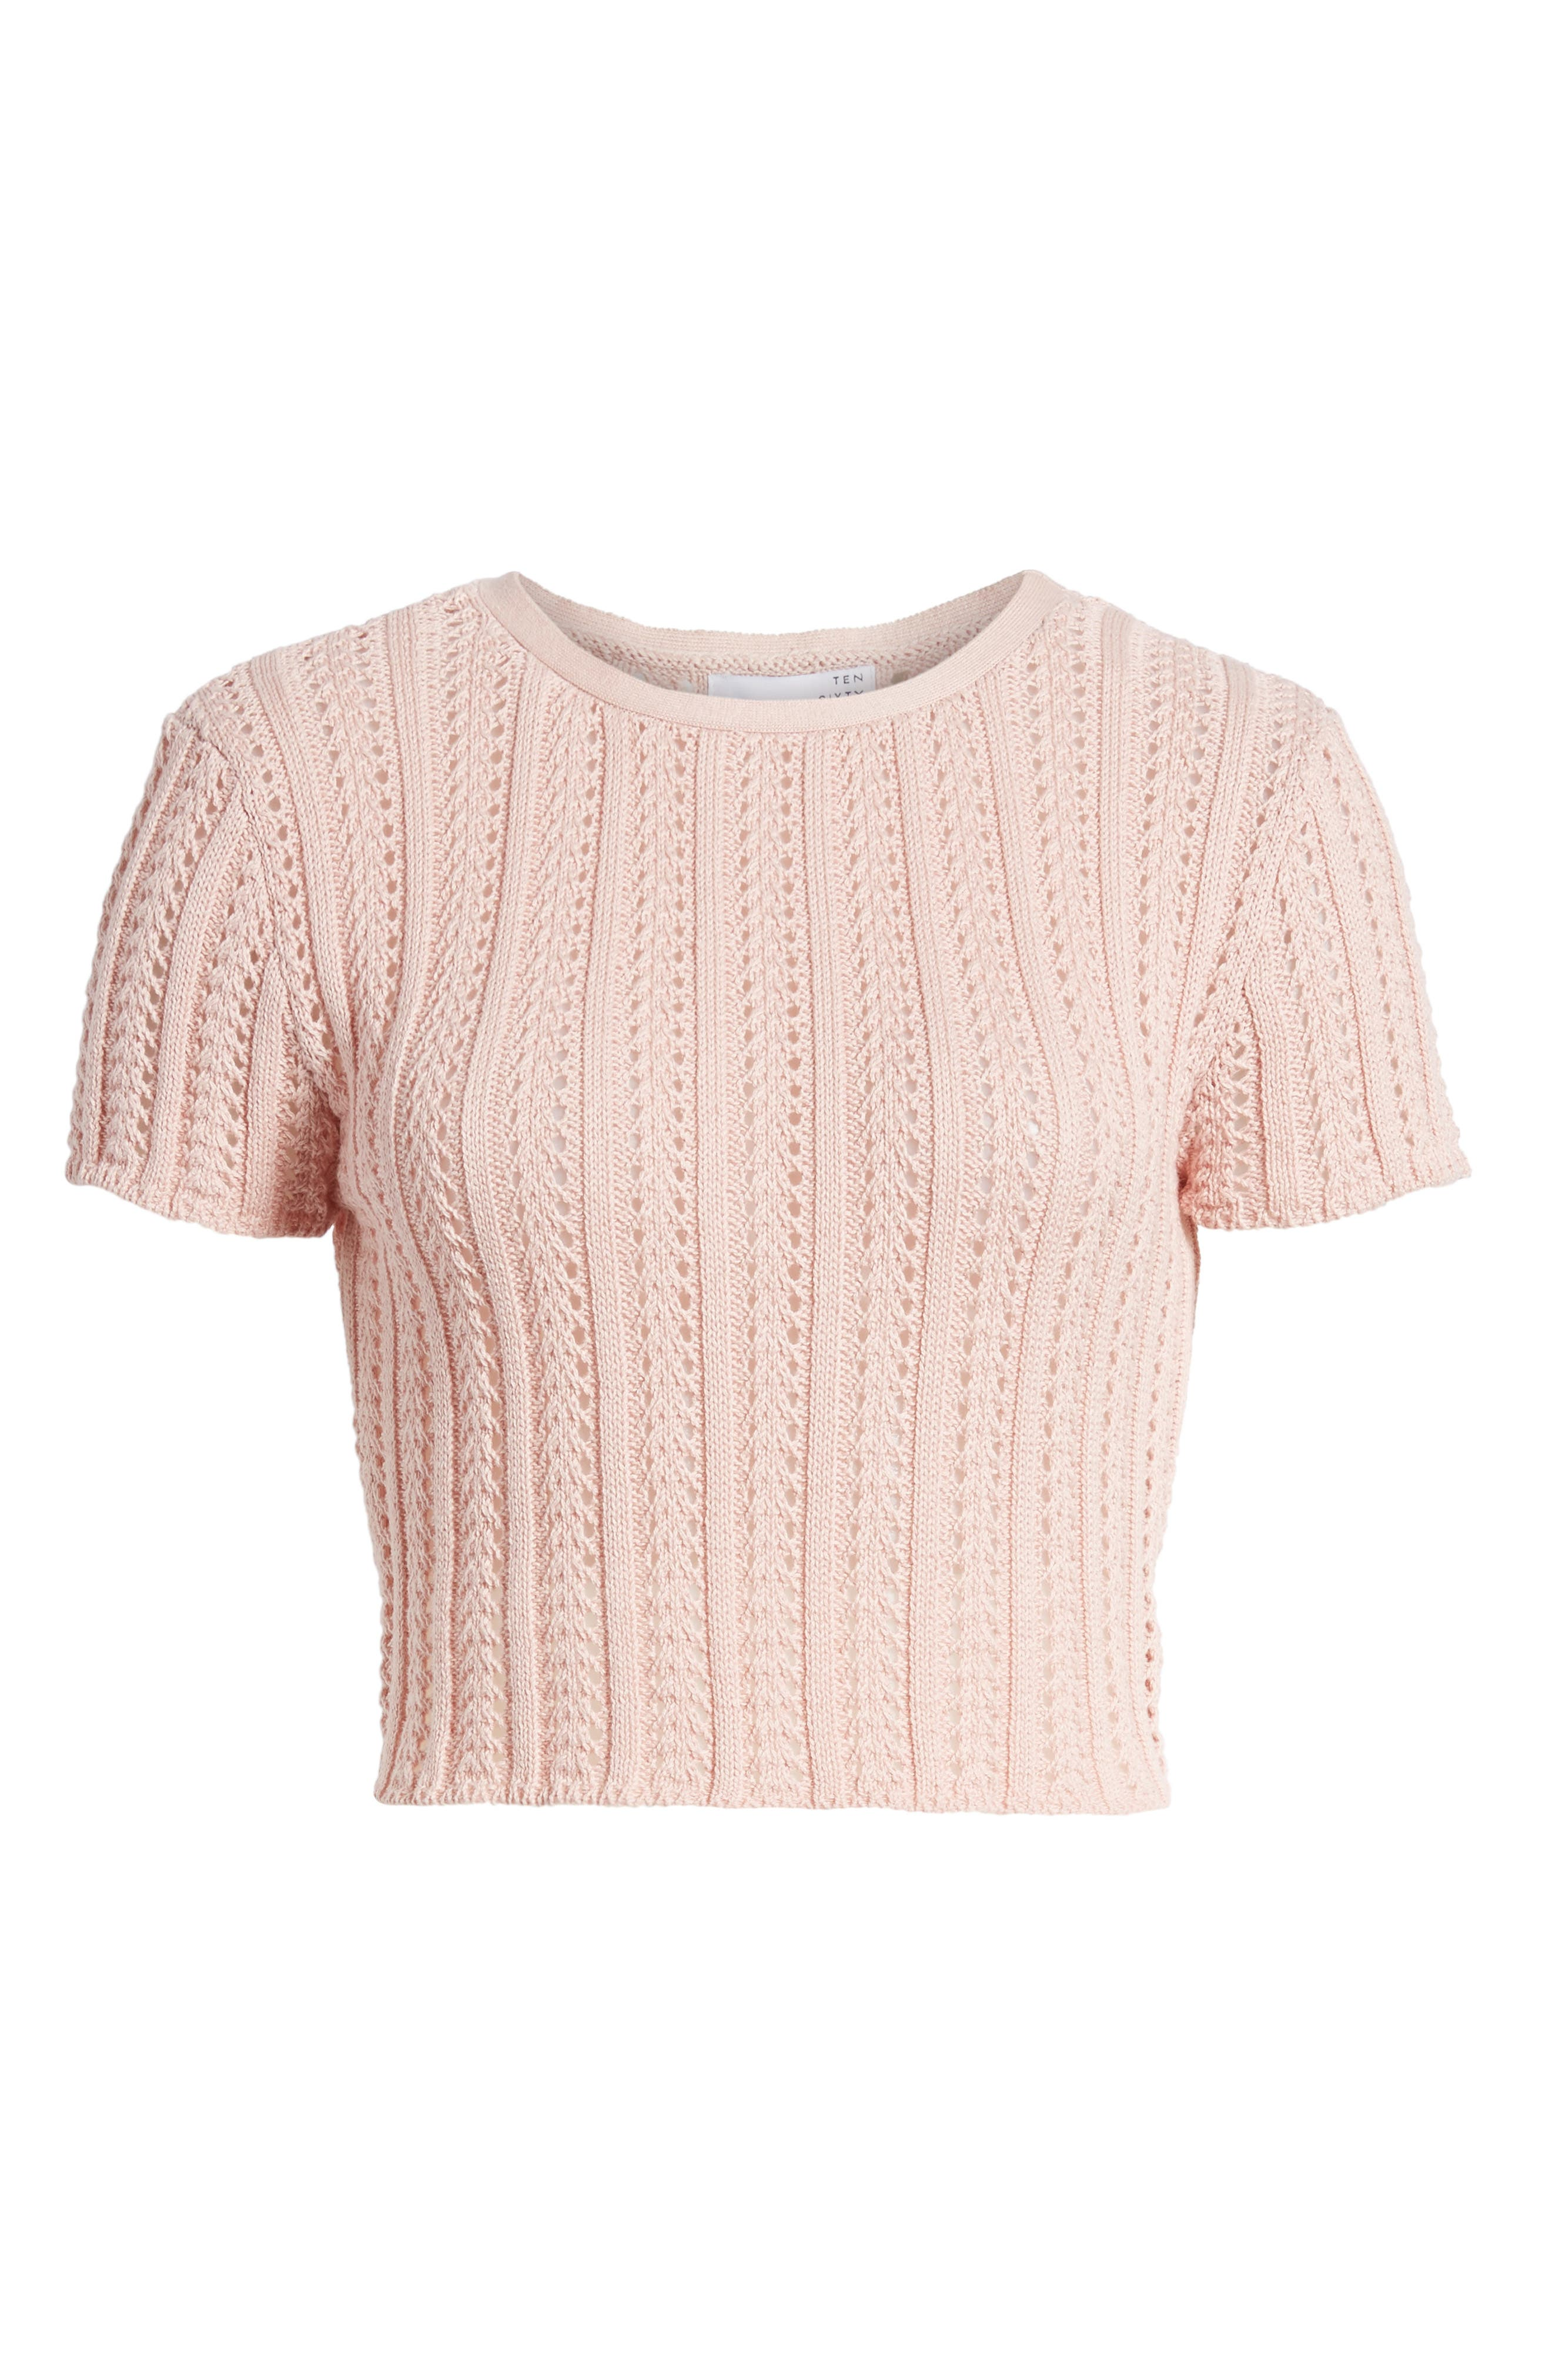 Crop Sweater,                             Alternate thumbnail 6, color,                             651